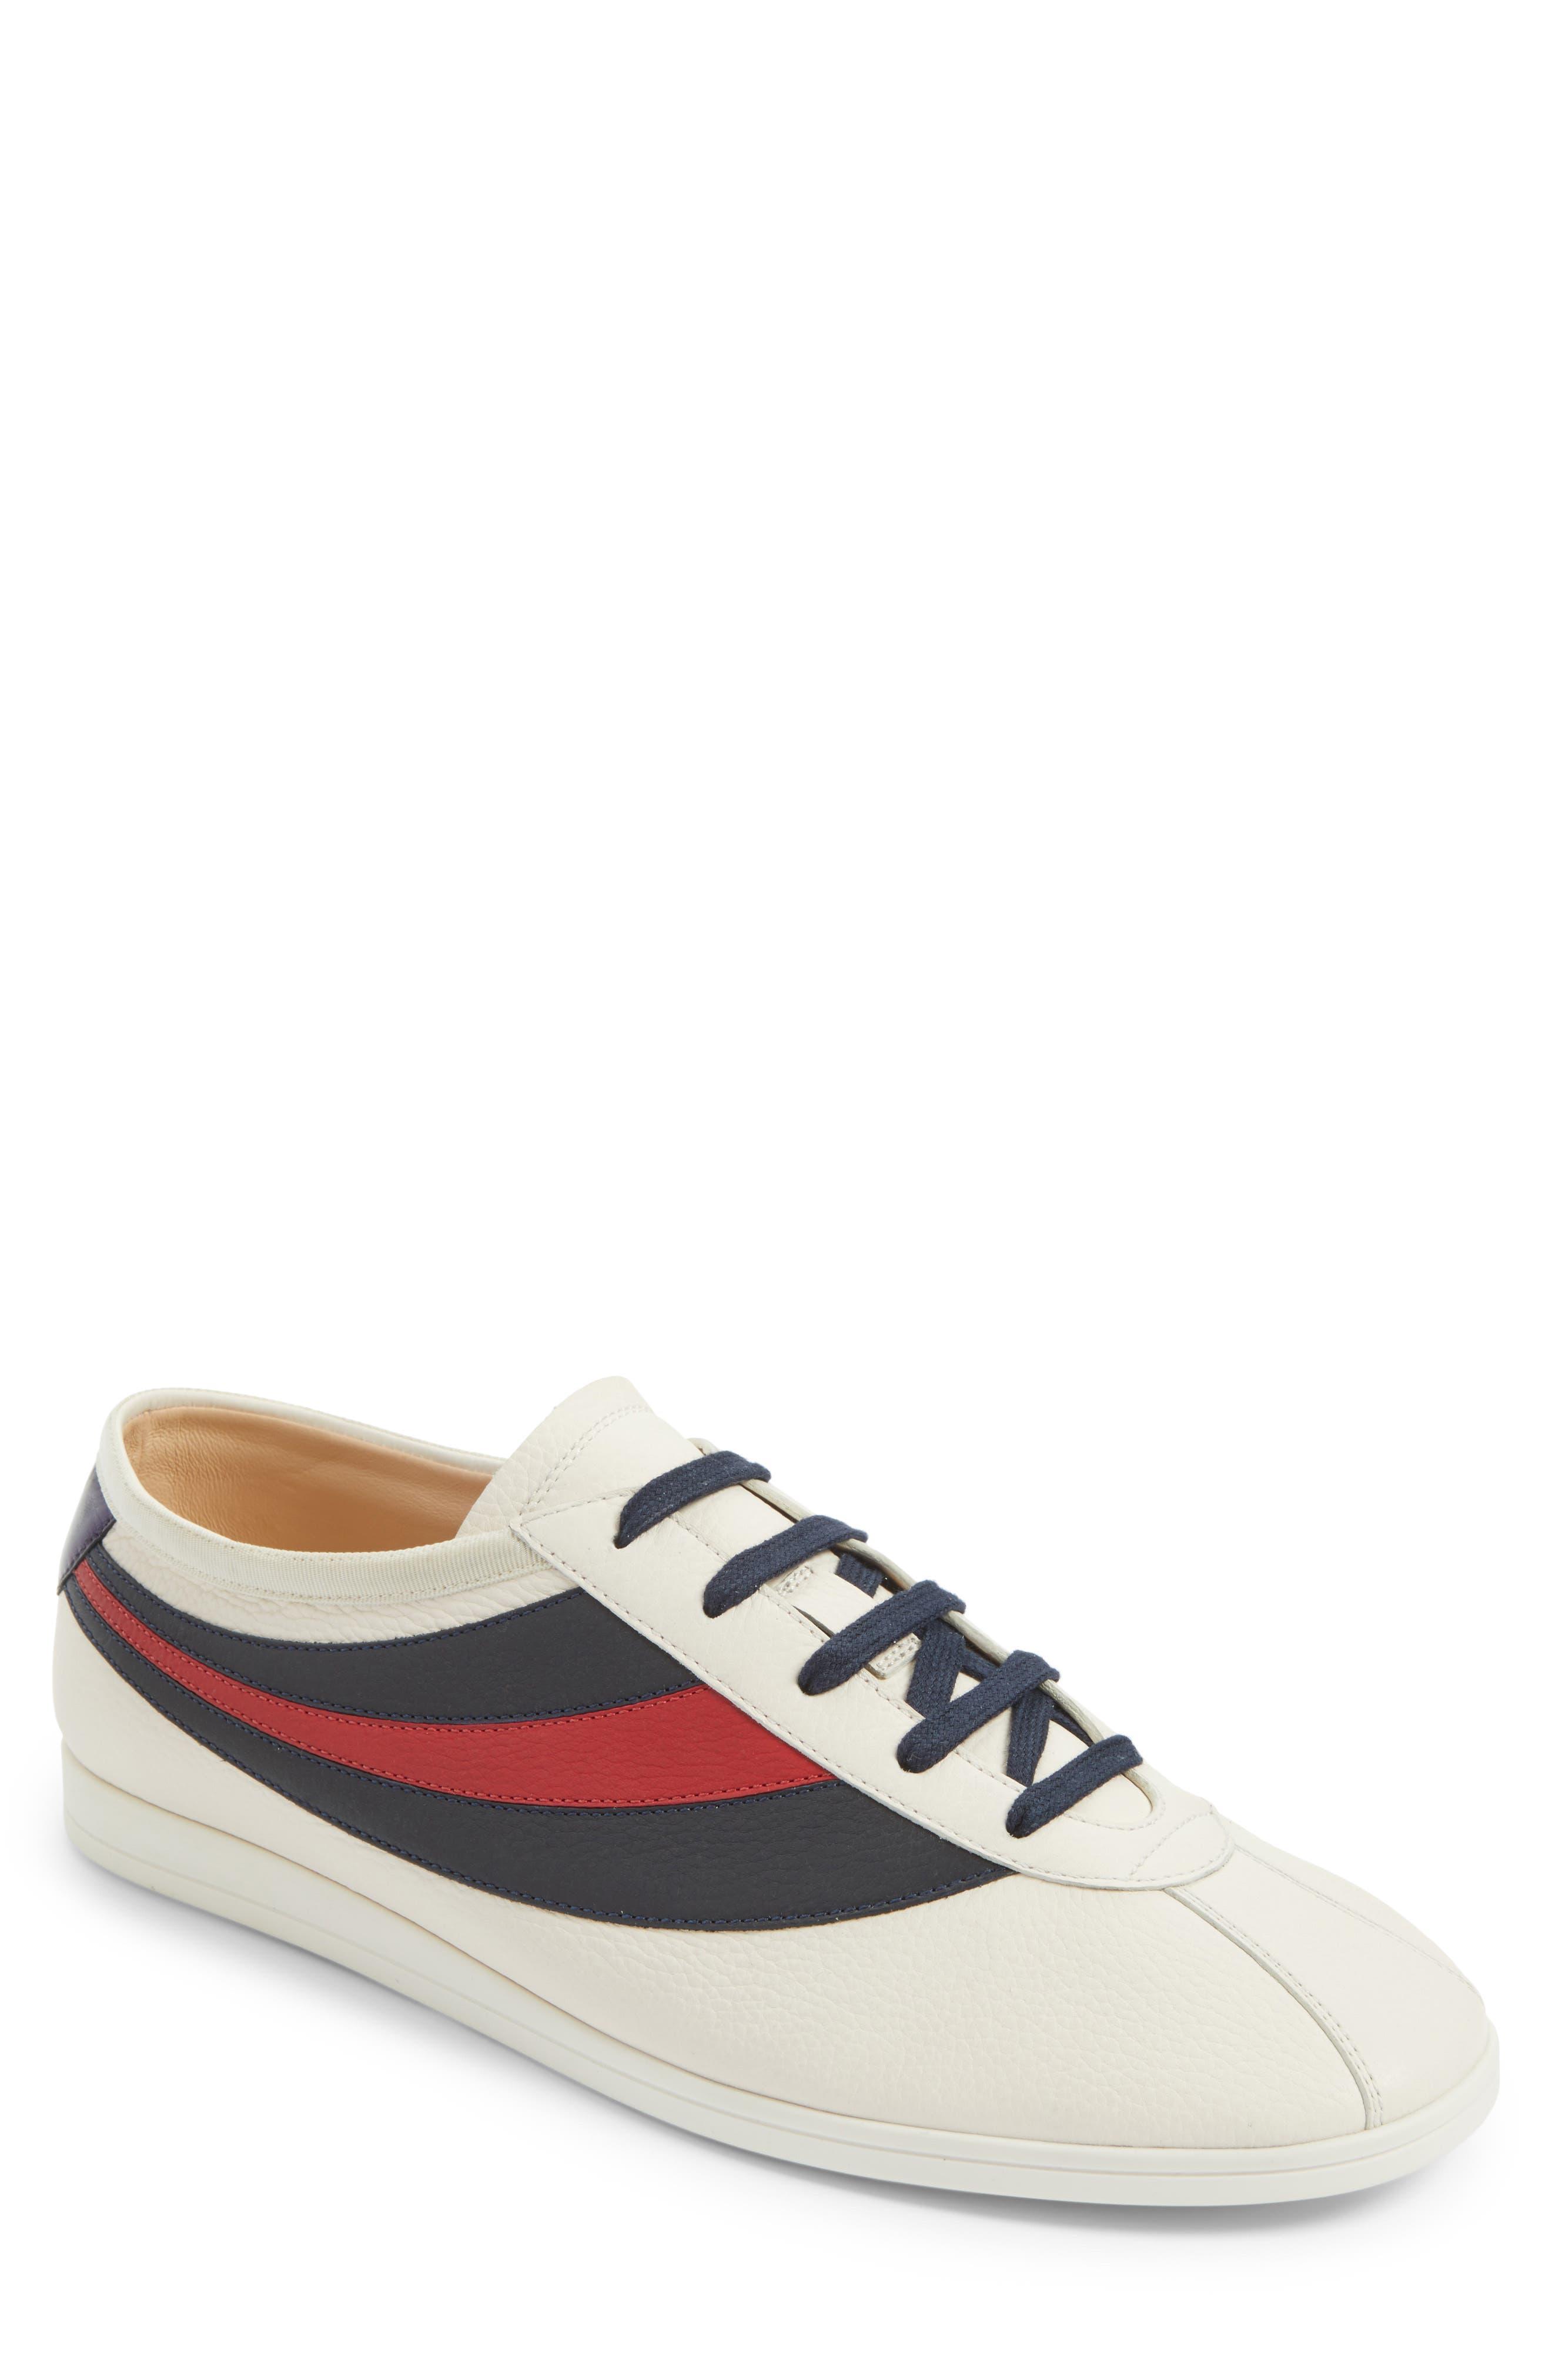 Falacer Sneaker,                             Main thumbnail 1, color,                             106